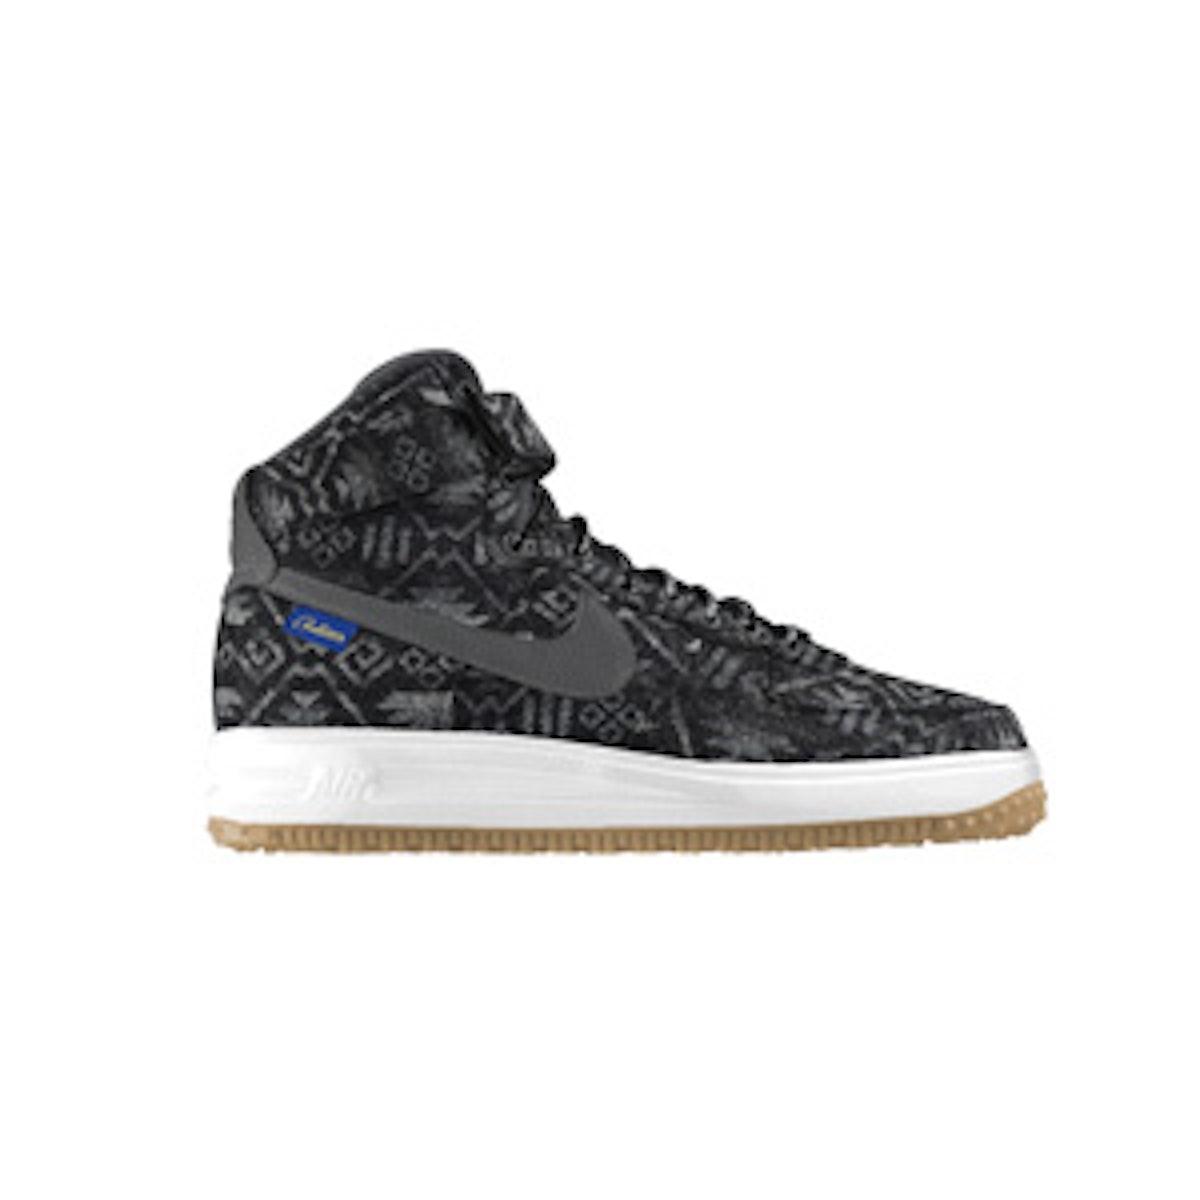 Air Force 1 Pendleton x Nike